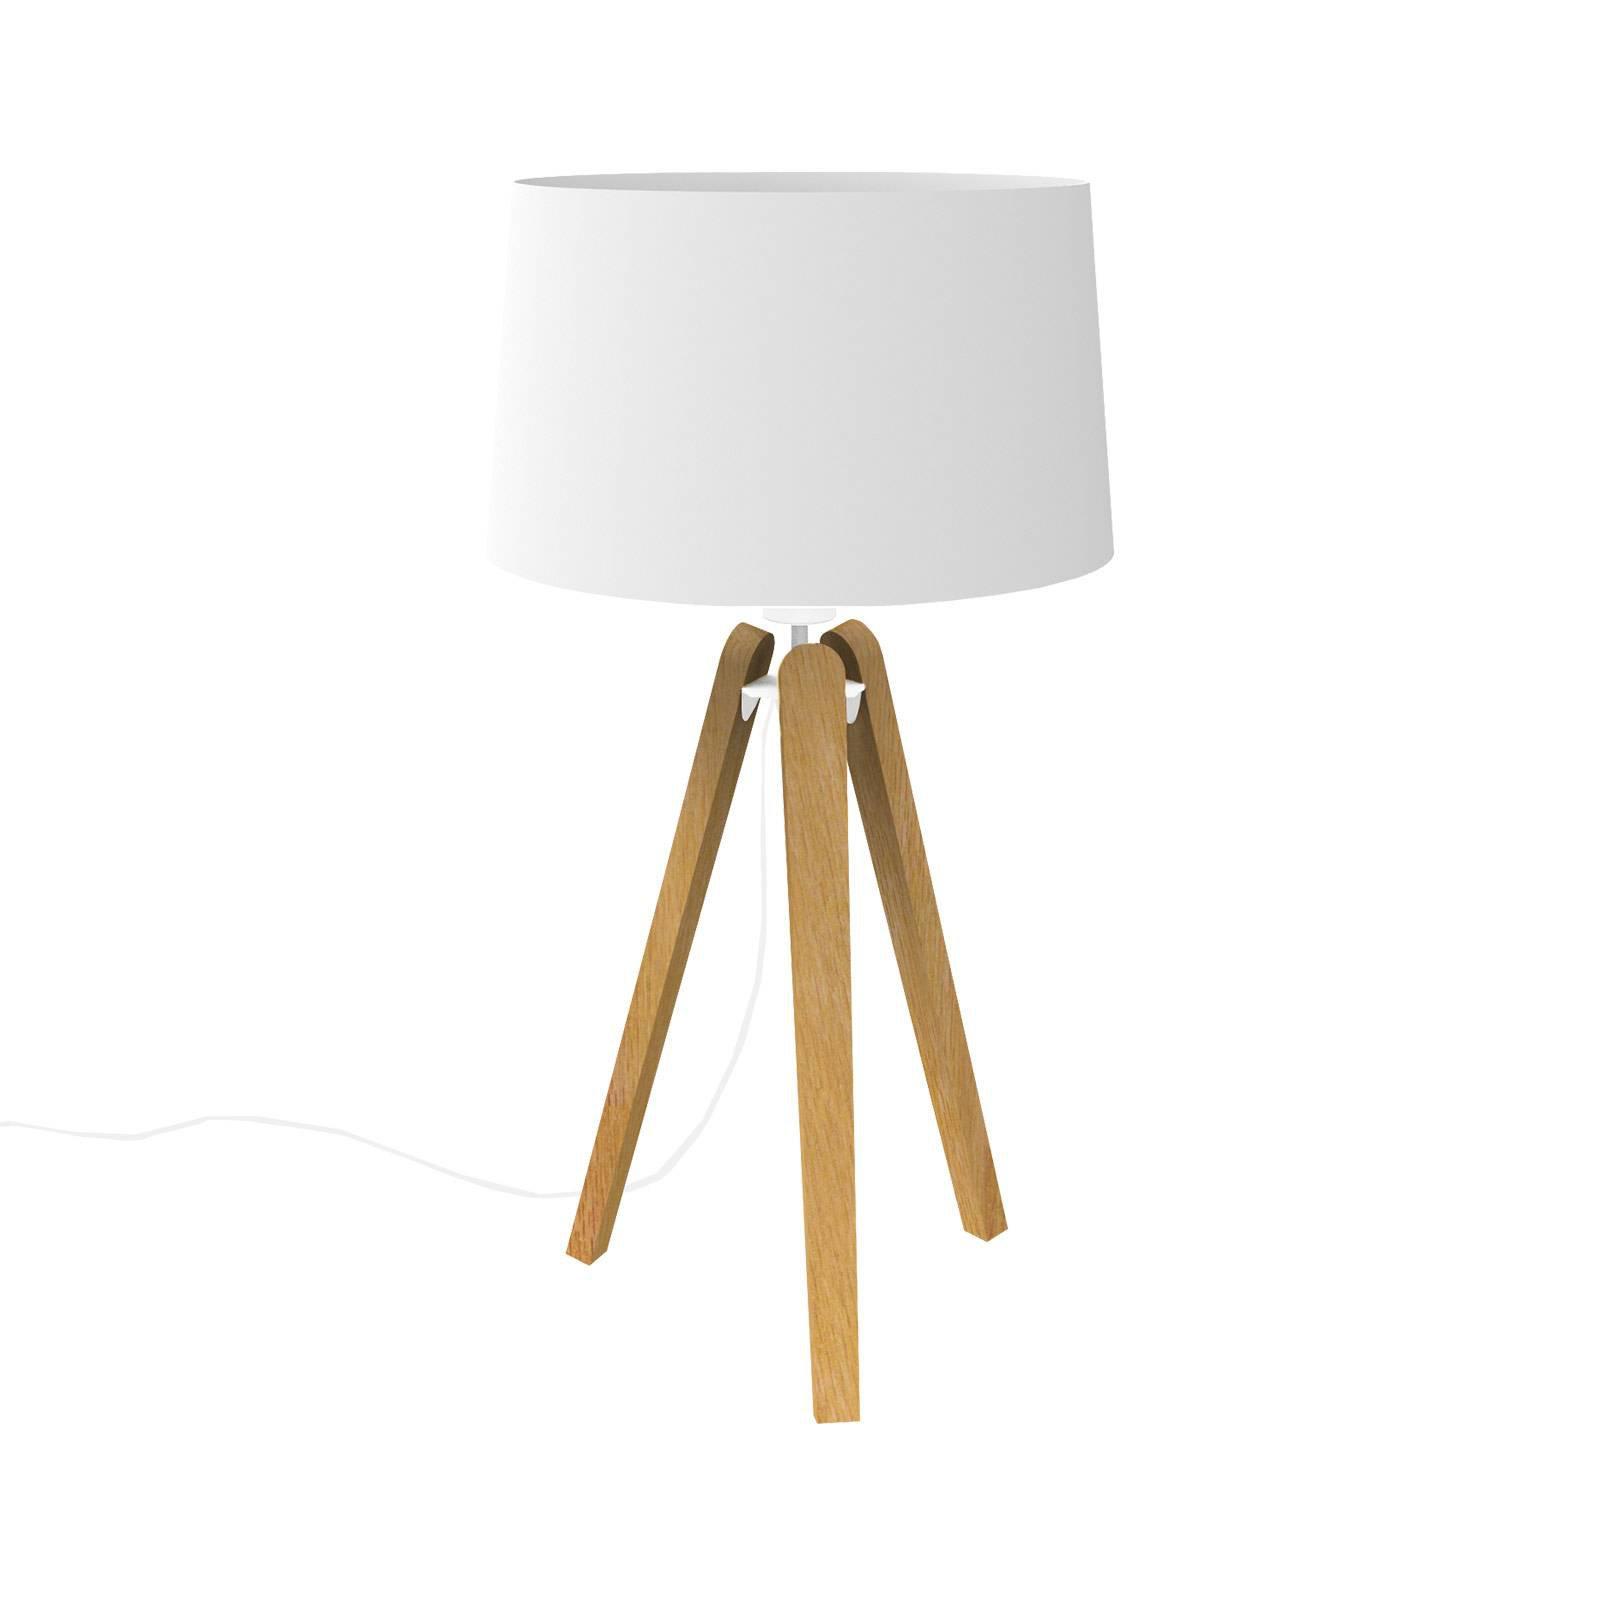 Essence LT bordlampe i tre og tekstil, hvit